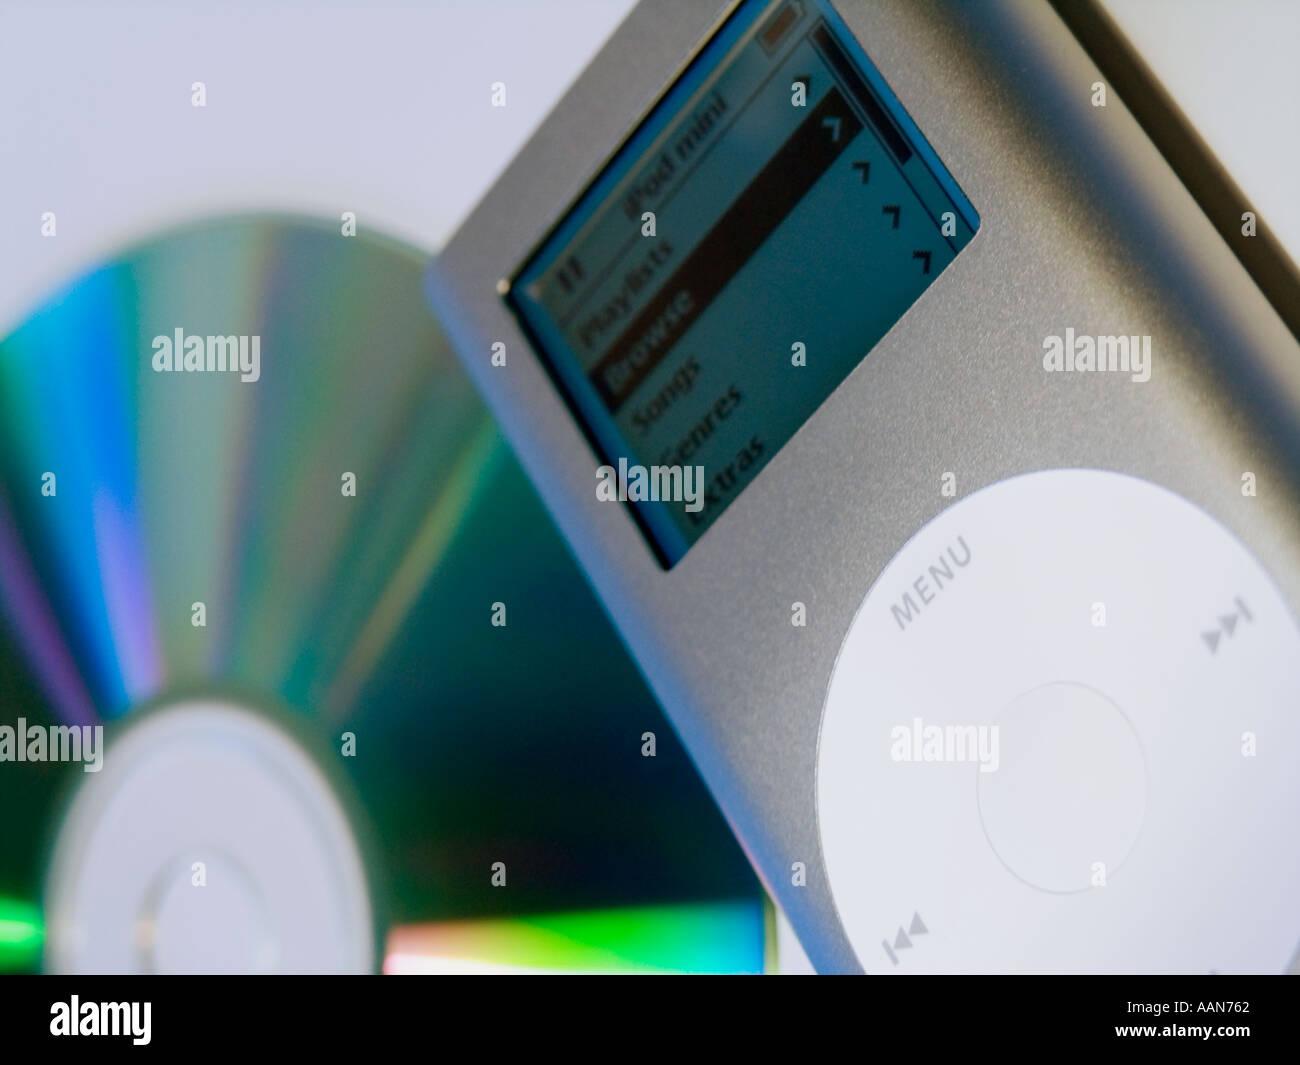 Apple Ipod Mini Mp3 Player Stock Photos & Apple Ipod Mini